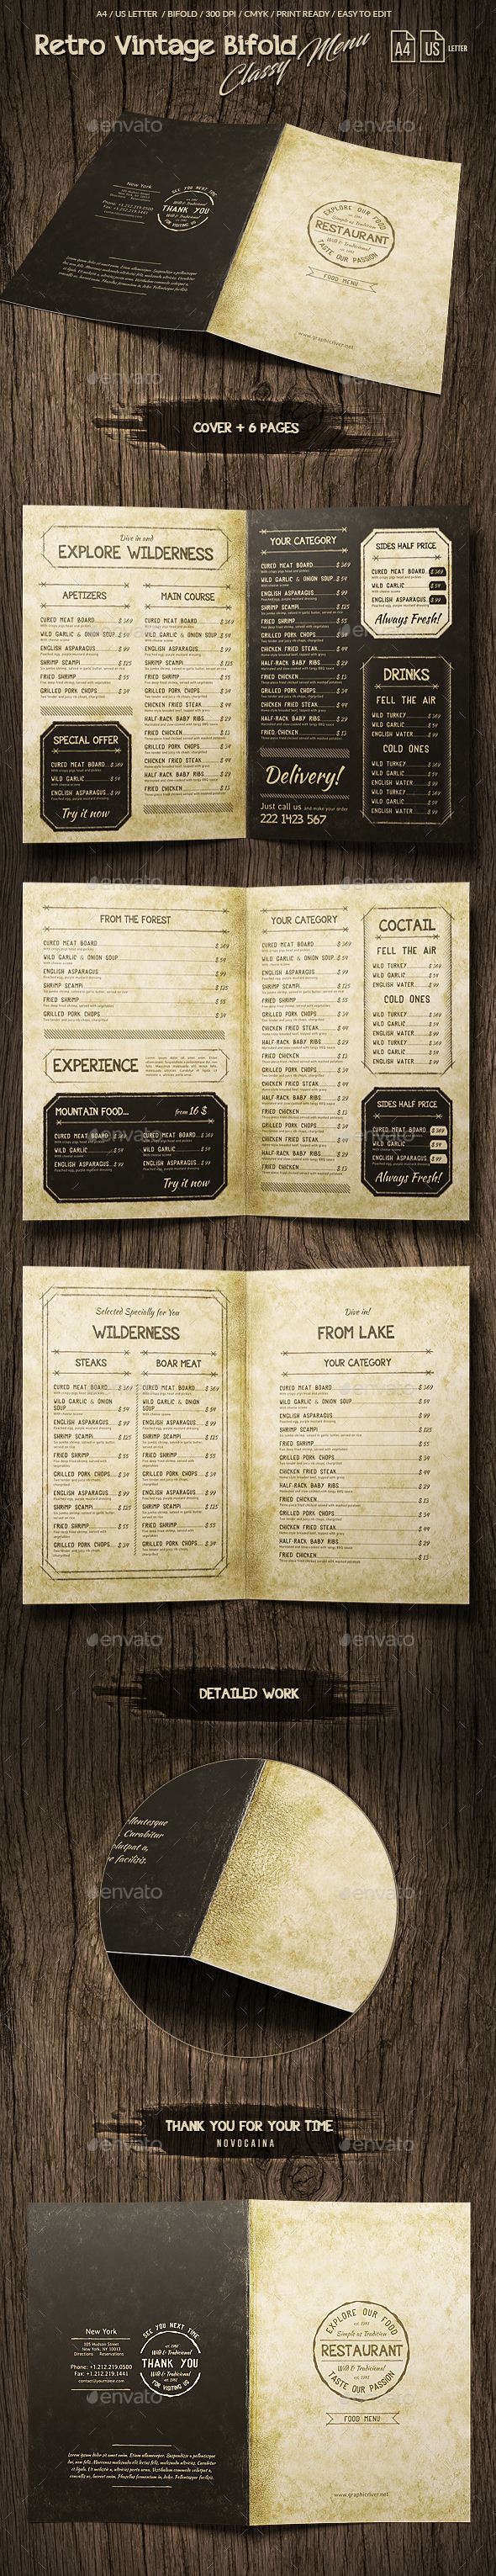 GraphicRiver Retro Vintage Bifold Classy Menu A4 & US Letter 8 pgs 20565207